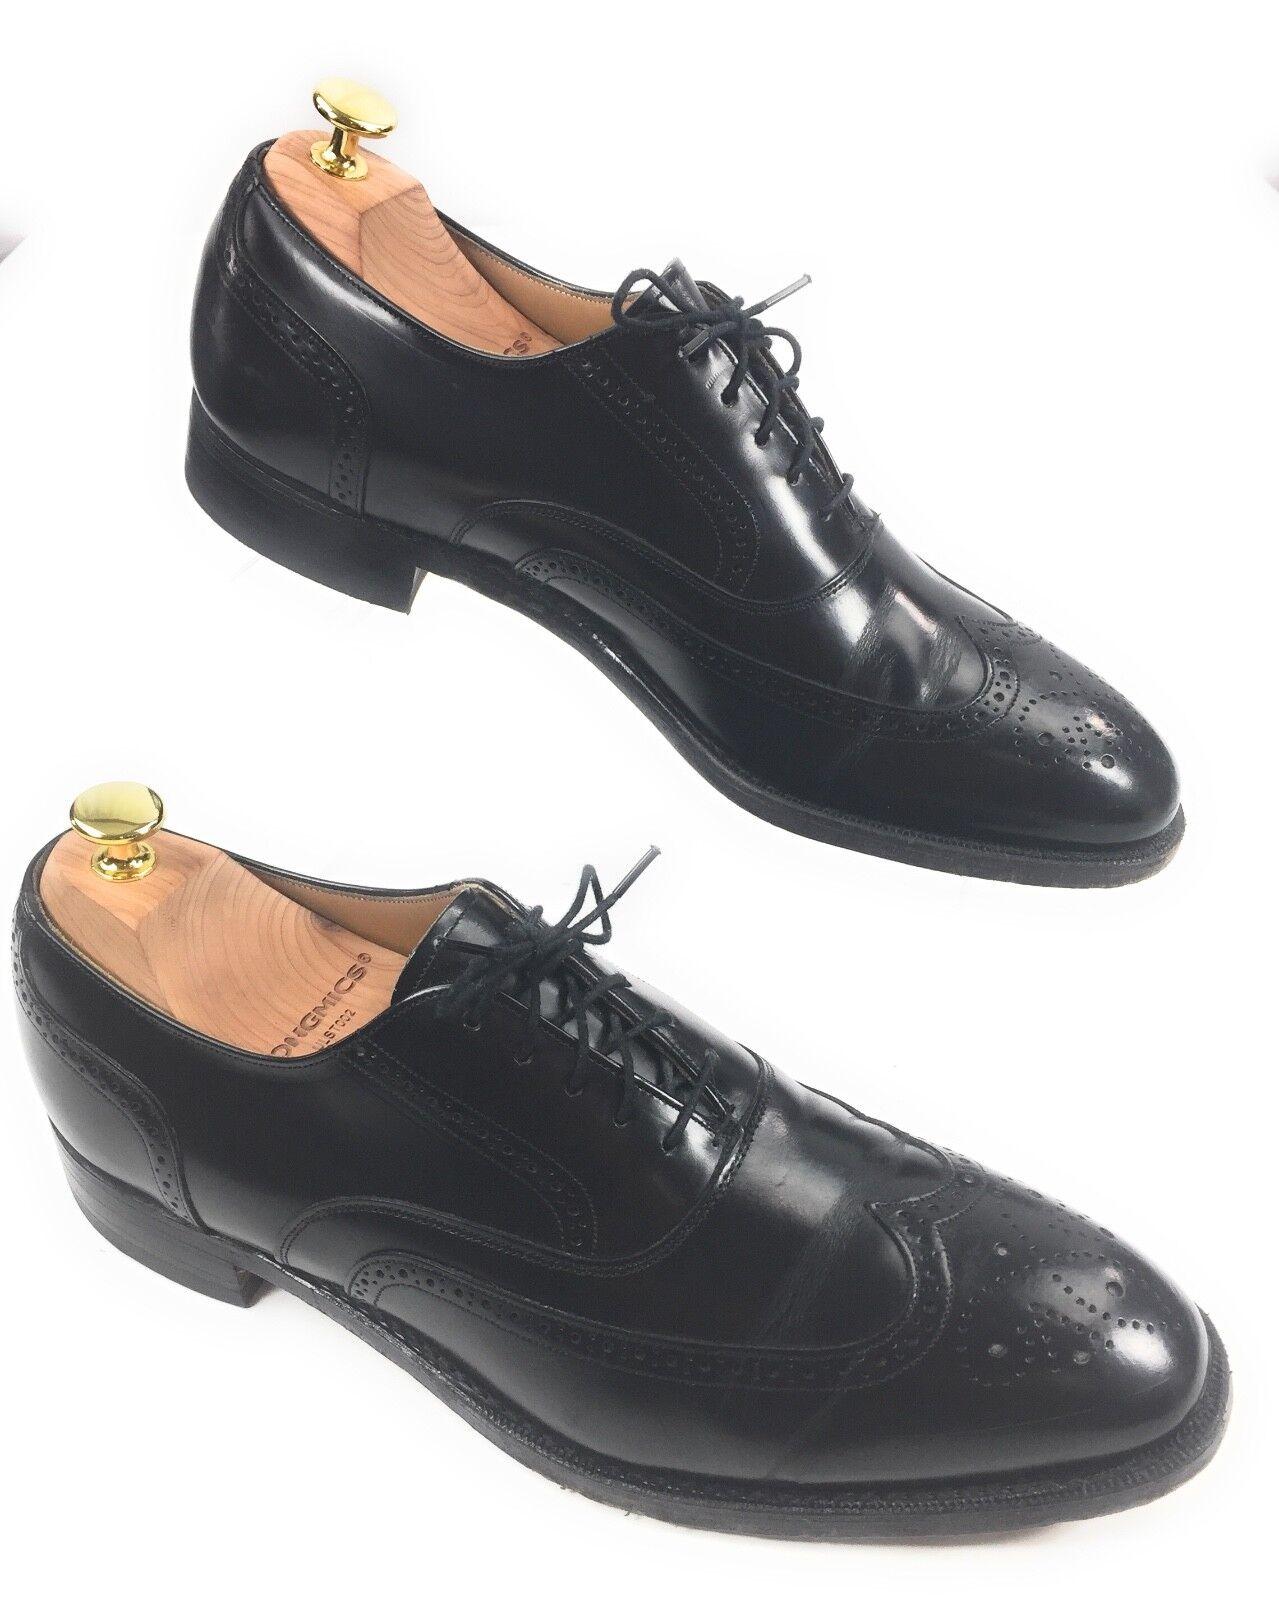 Johnston & Murphy Optima Black Leather Brogue Wingtip Oxford Shoes Mens 11 B USA